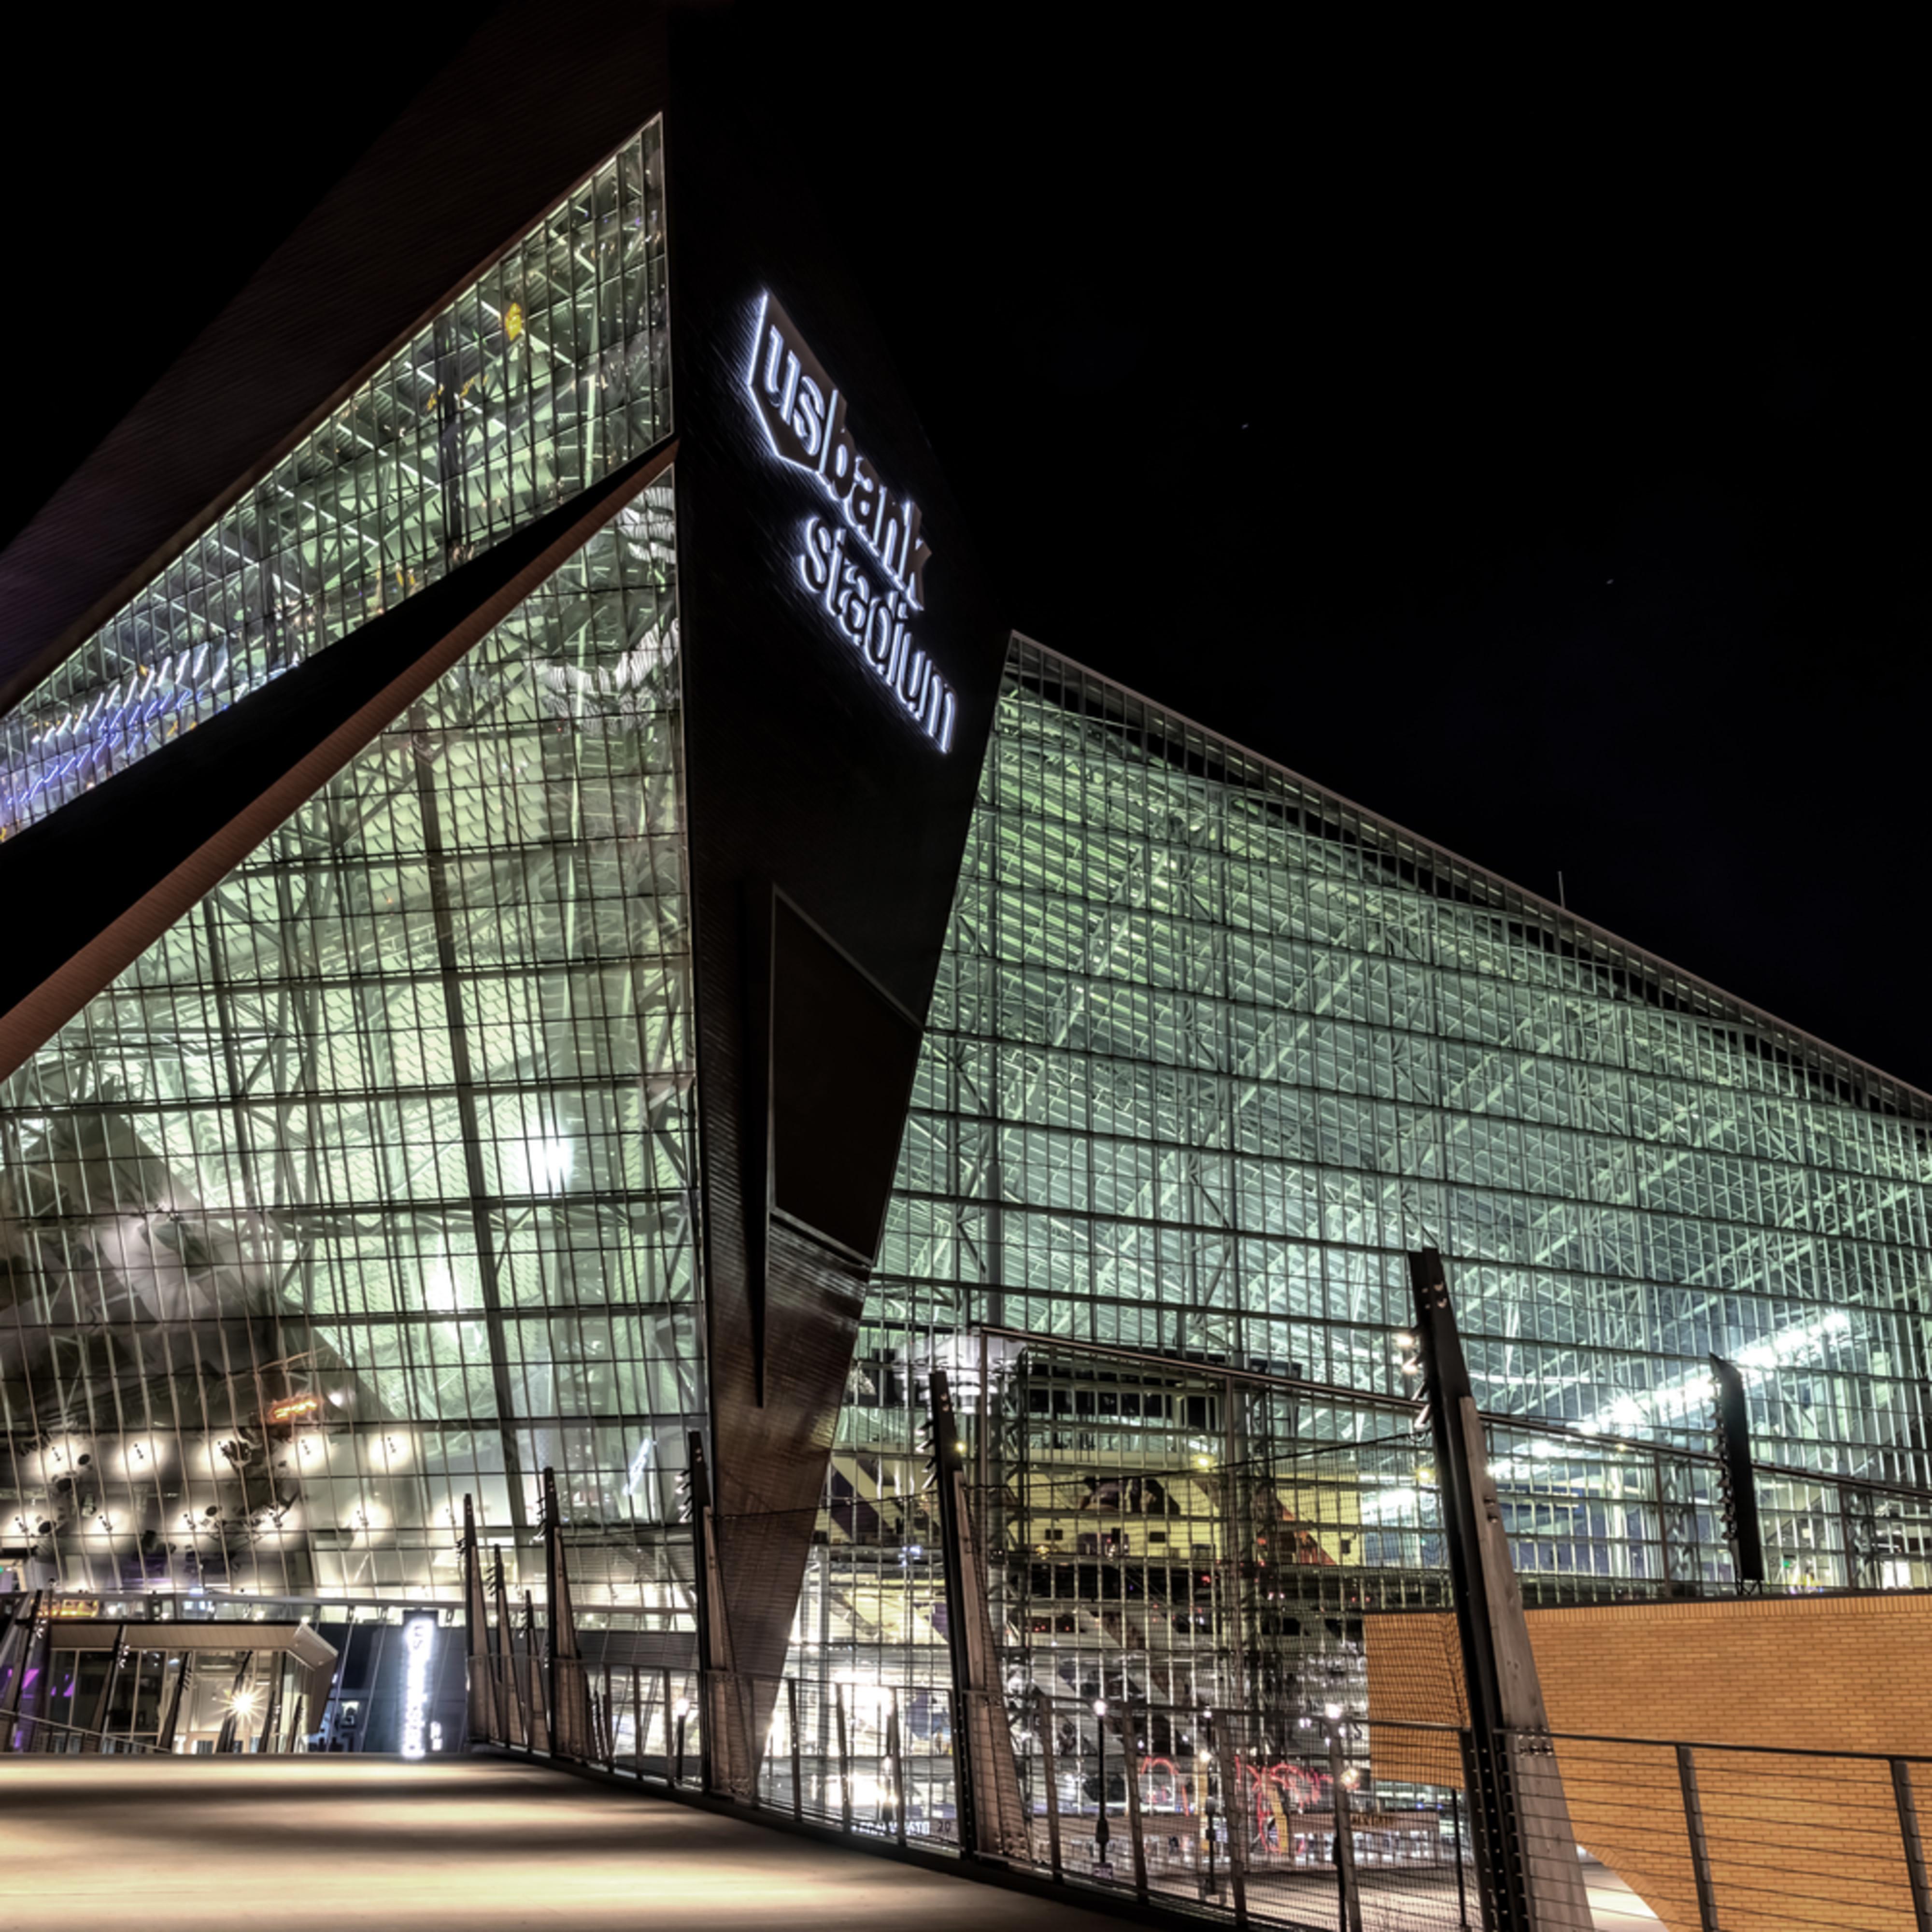 Us bank stadium closeup l3k1lj